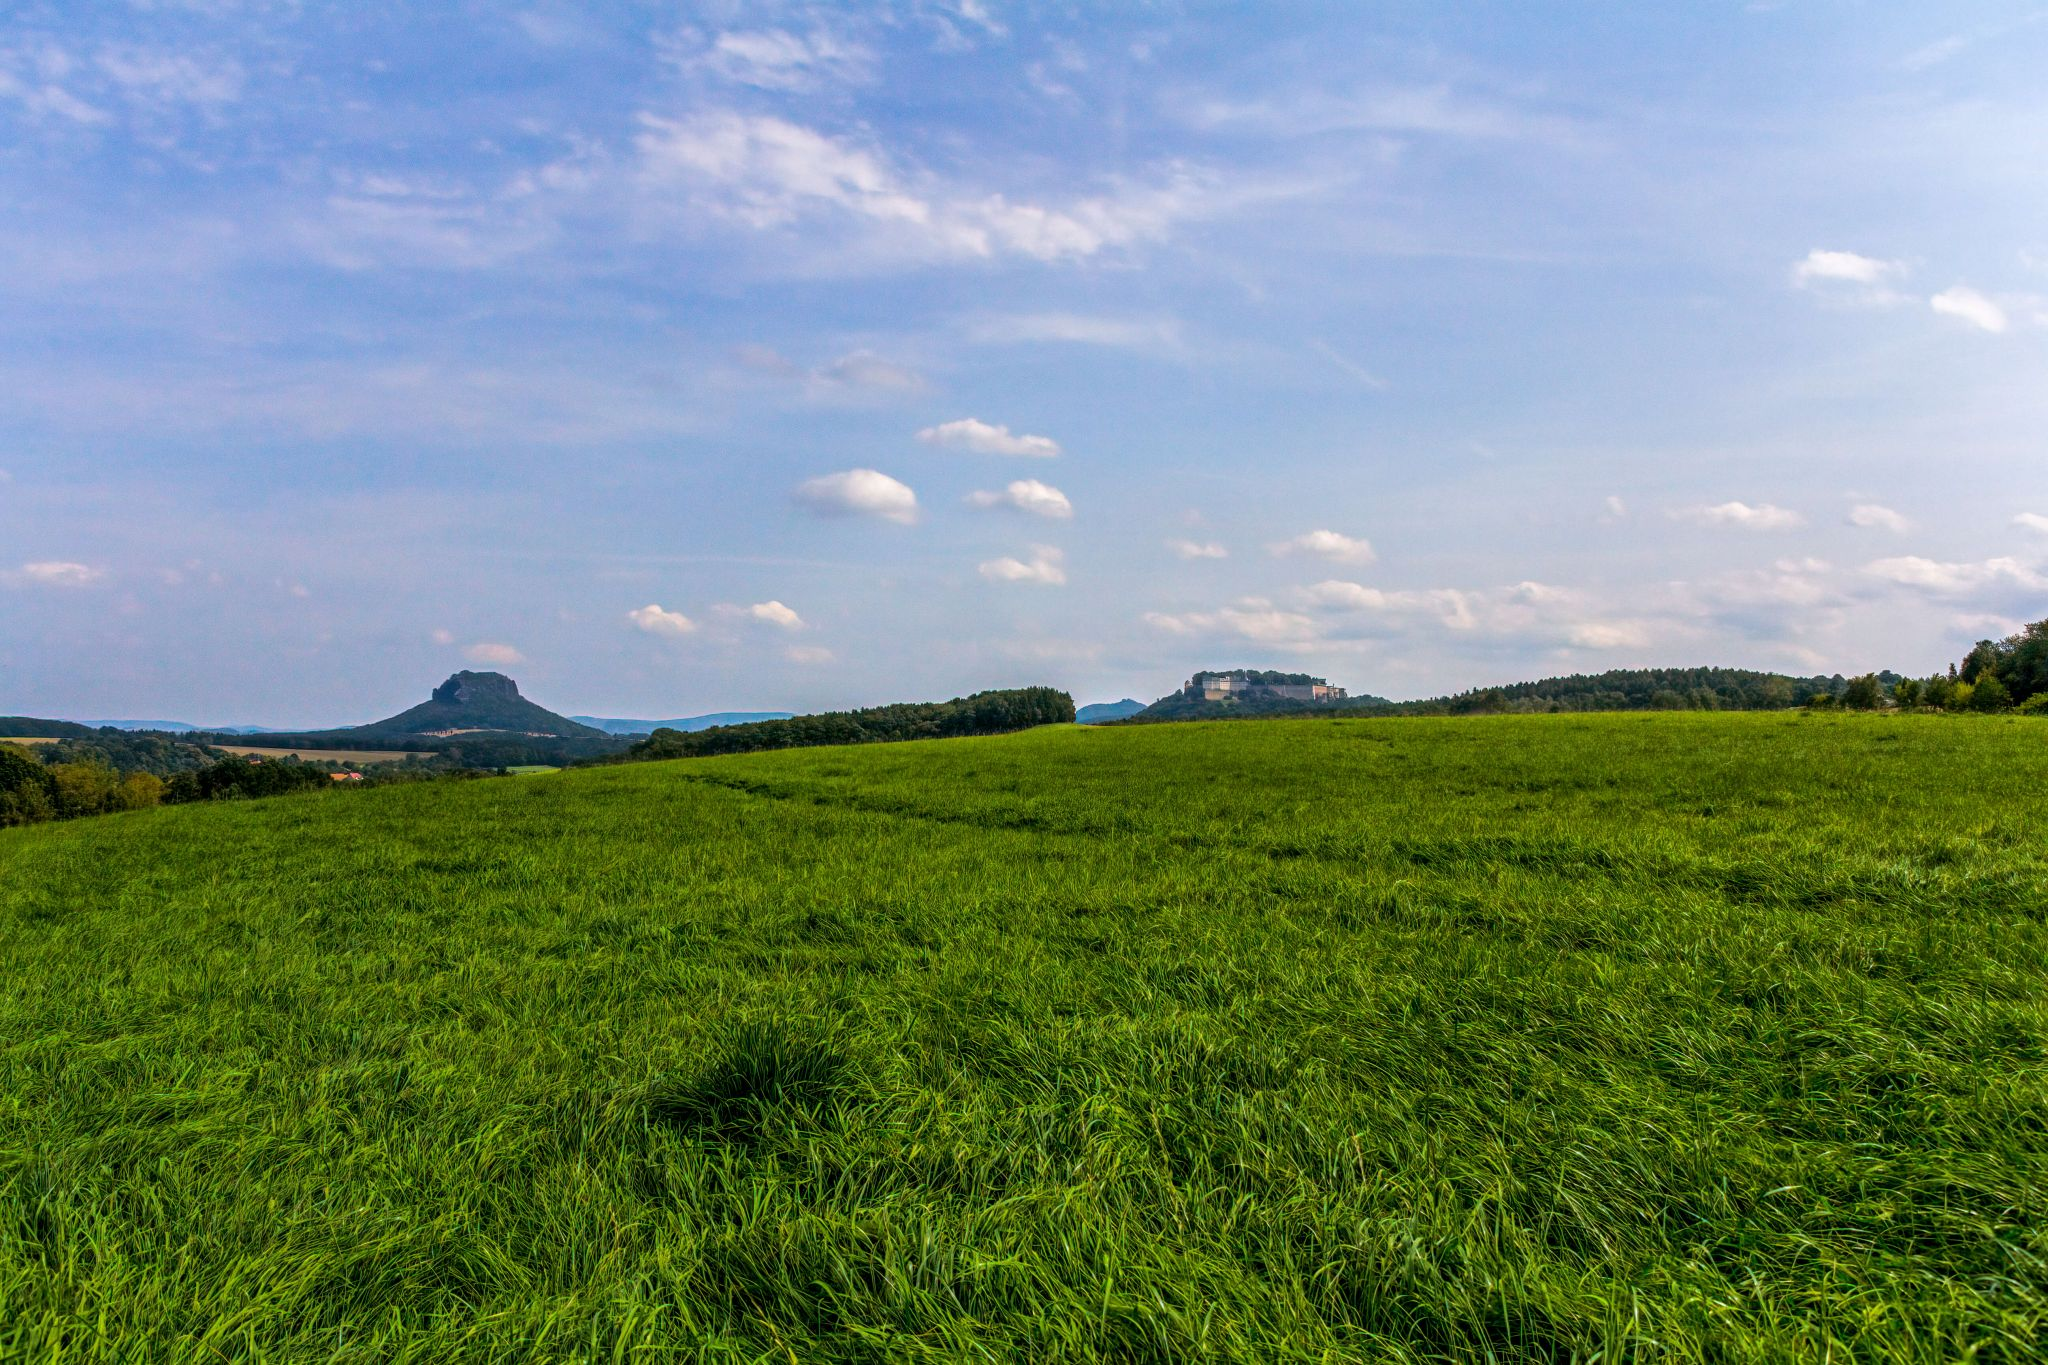 Koenigstein Fortress and the Lilienstein, Germany